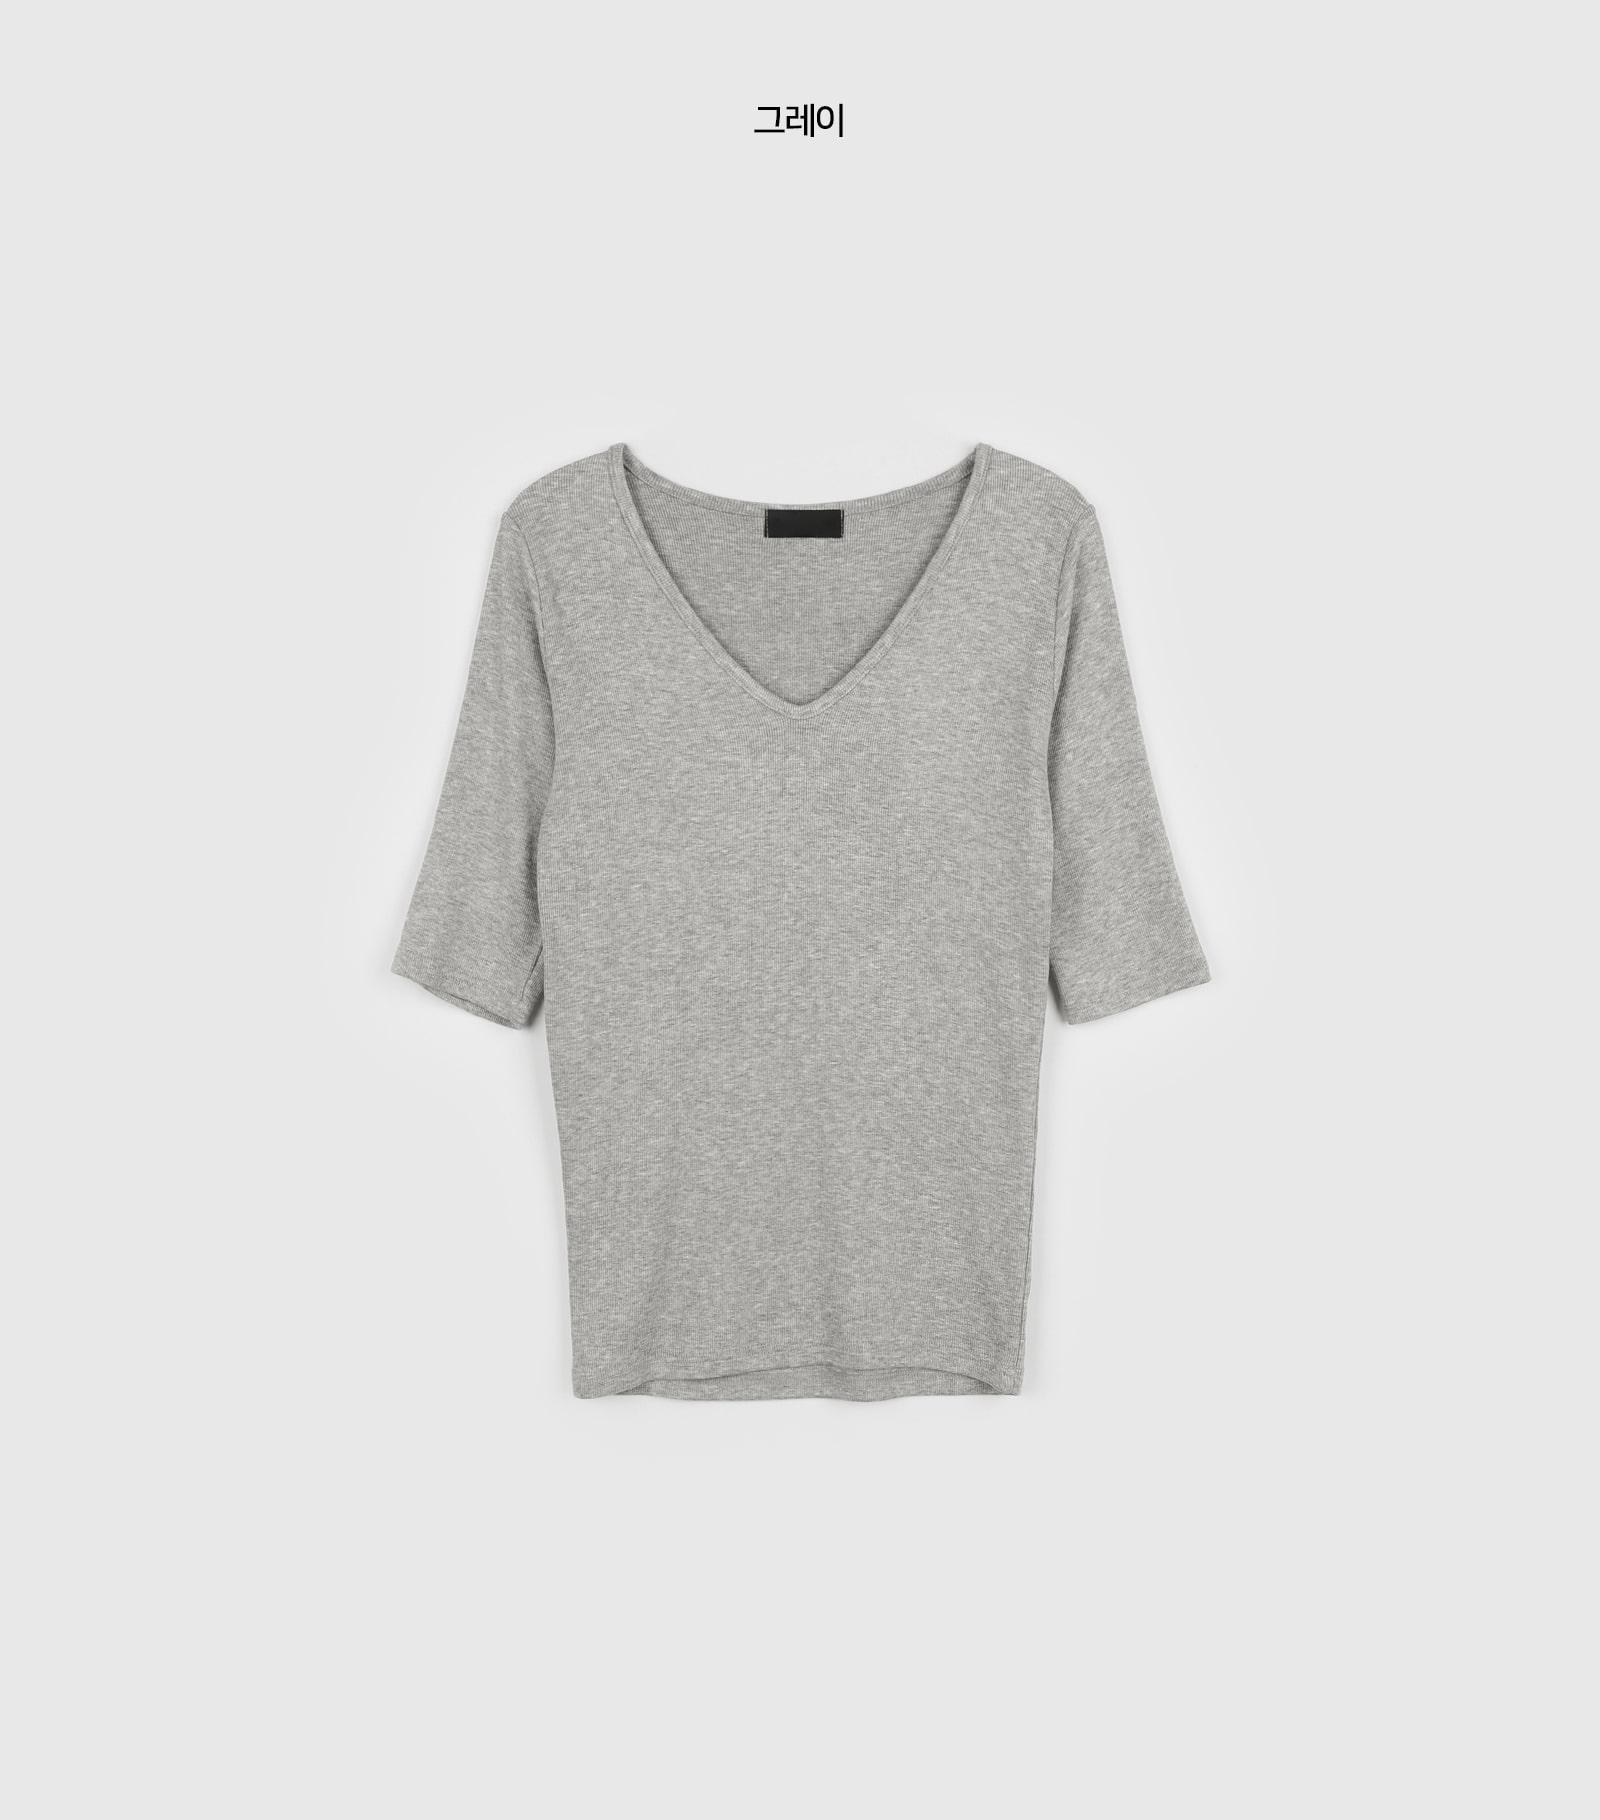 Spring Ribbed V-neck T-shirt